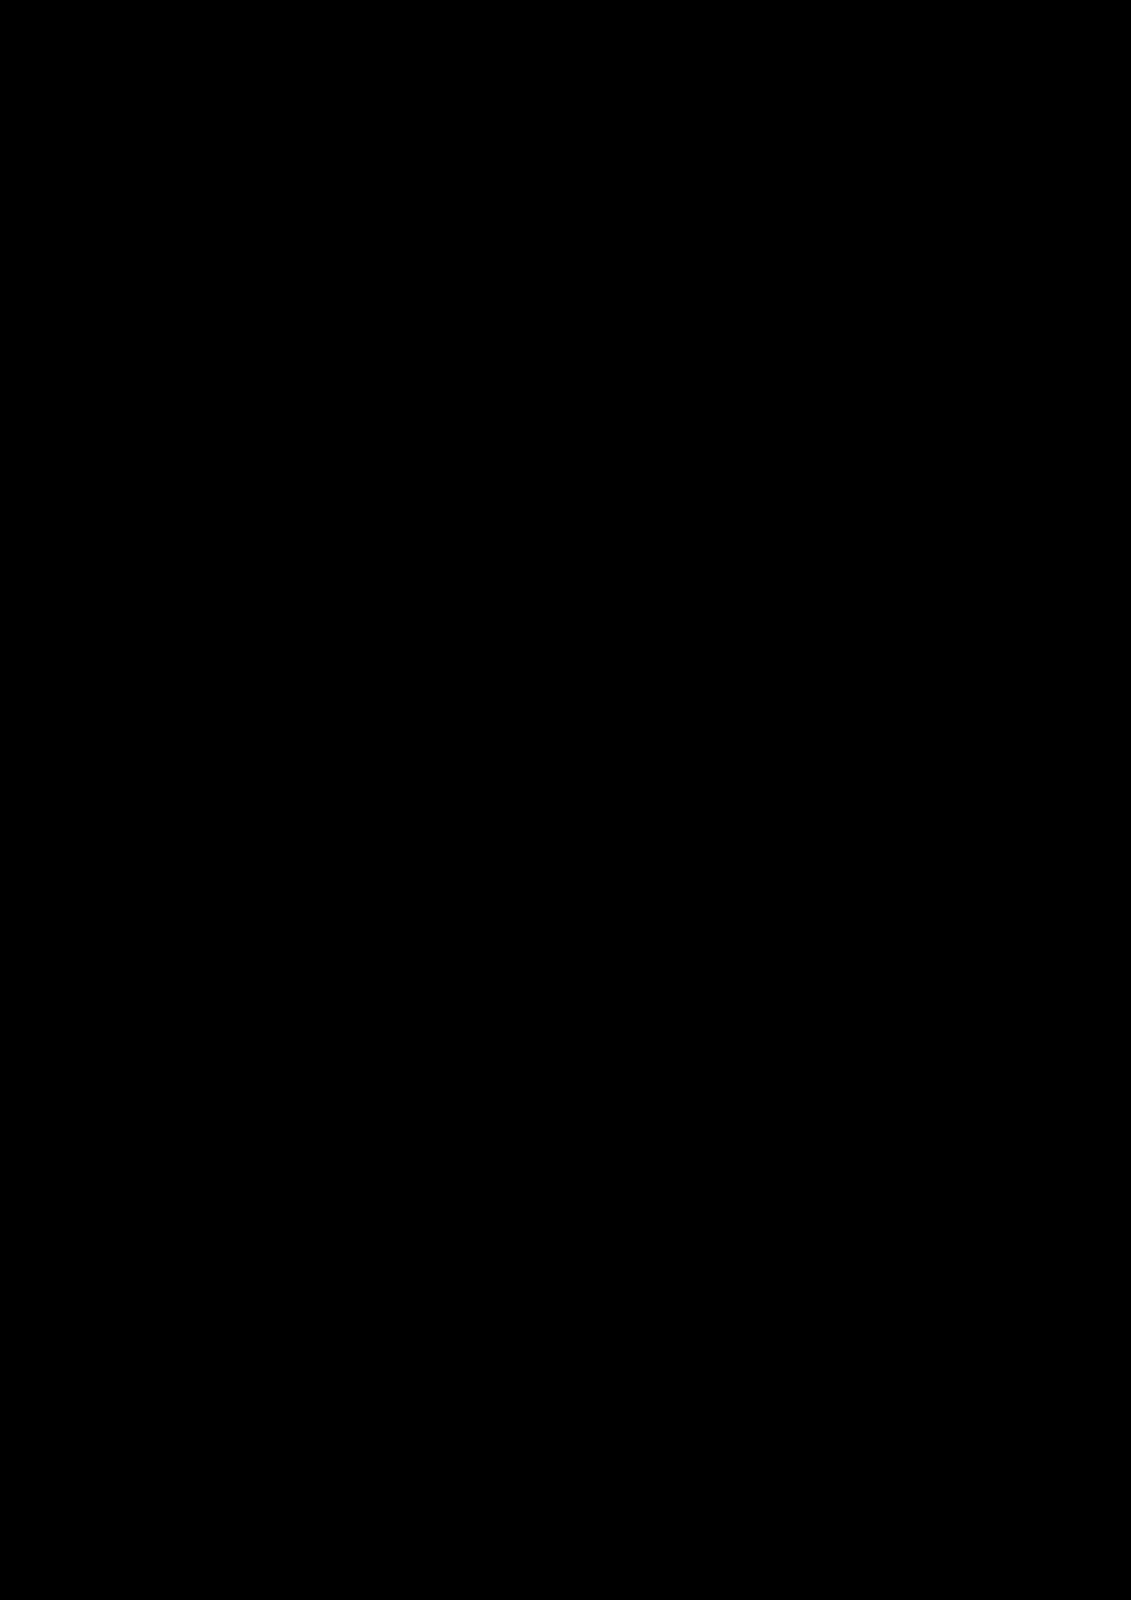 Diegosax The Lord Of The Rings De Howard Shore Partitura De El Senor De Los Anillos Para Flauta Saxofon Trompeta Clarinete Violin Saxo Tenor Trombon Tuba Viola Chelo Violin Oboe Trompa Corno